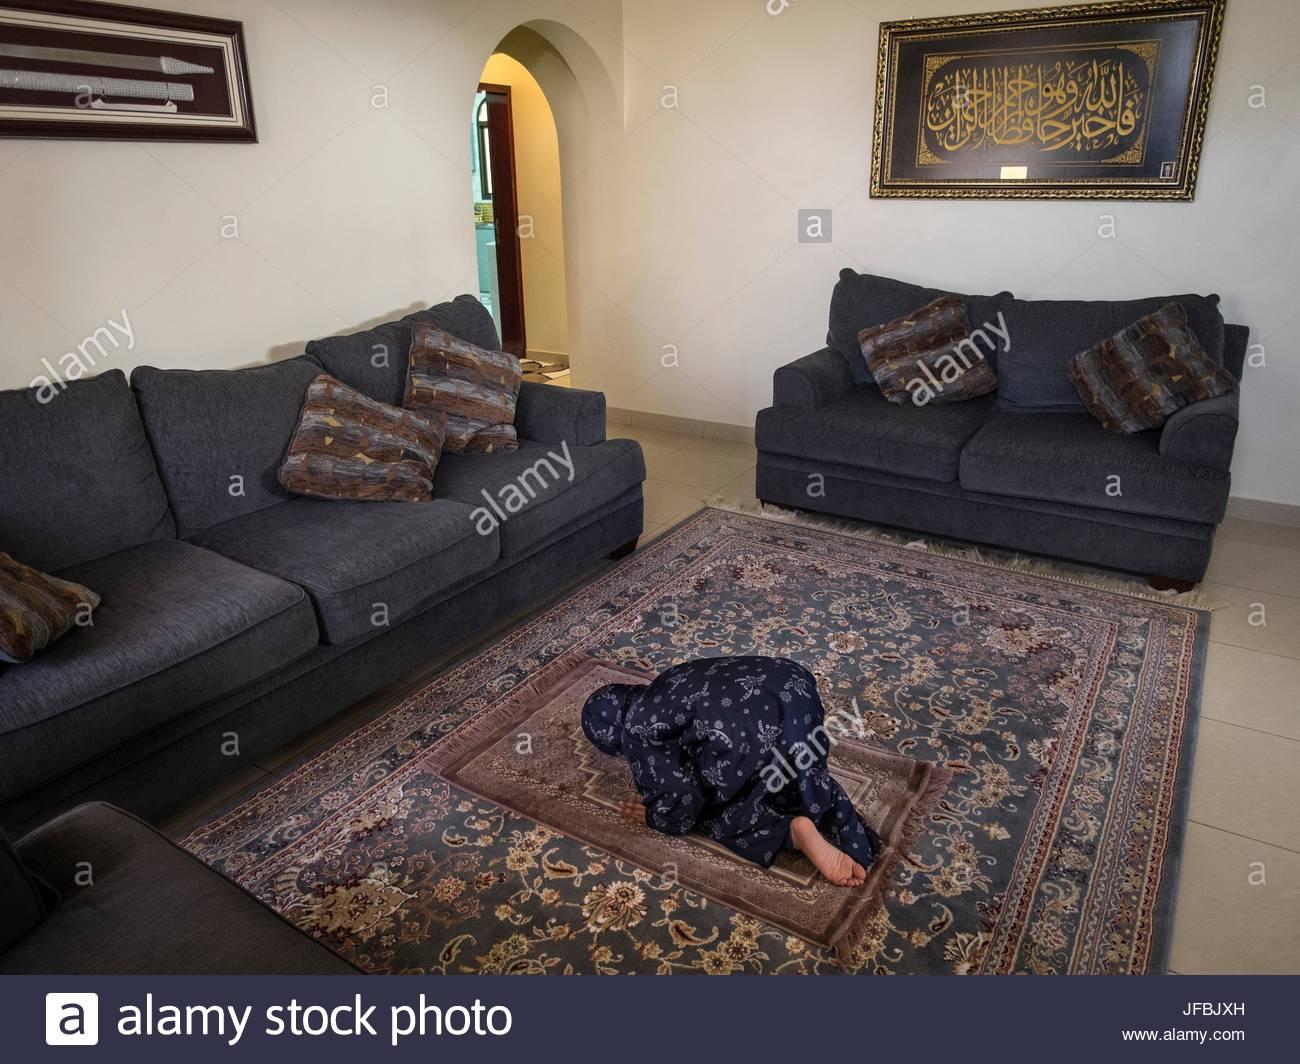 A 10 year old Muslim girl praying at home. - Stock Image